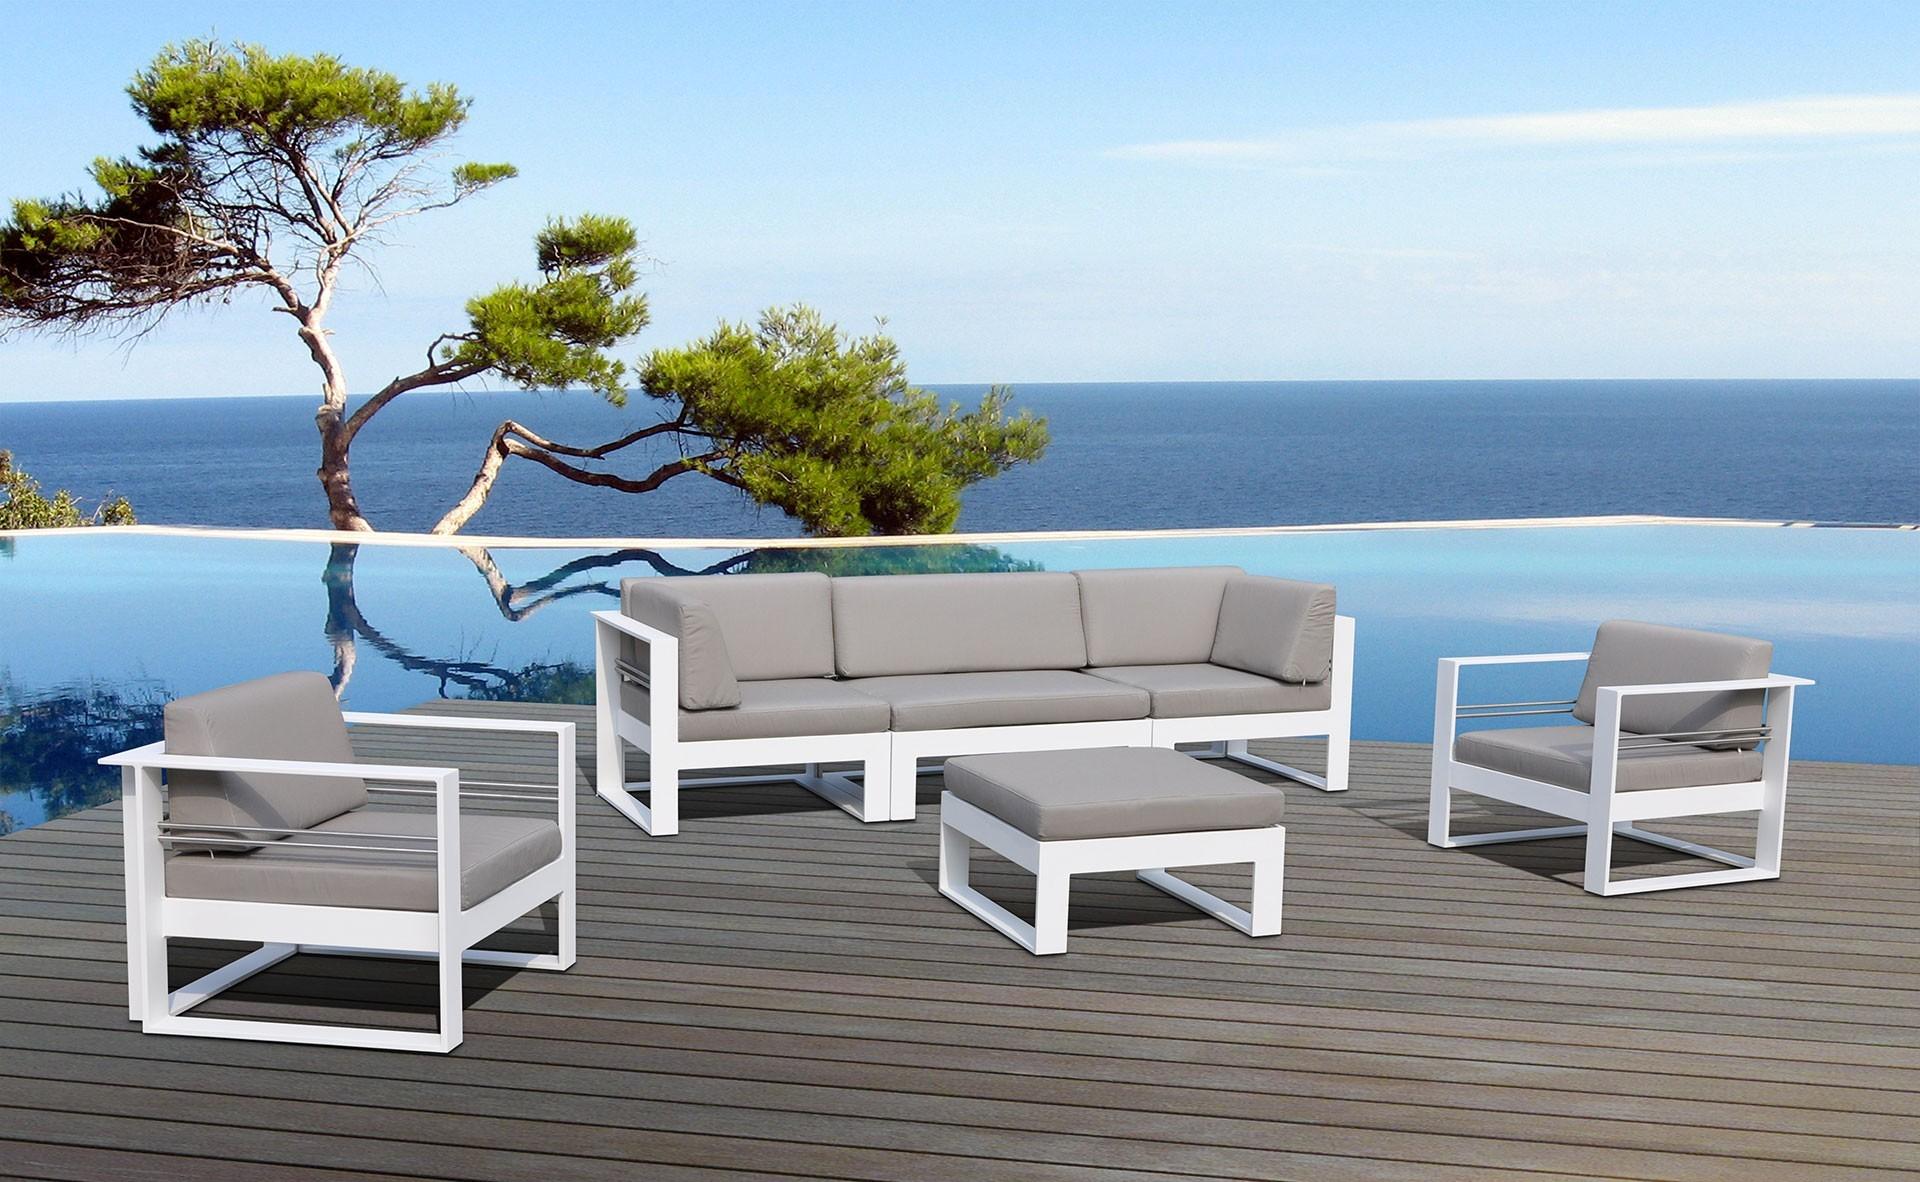 Salon de jardin design en aluminium - Mailleraye.fr jardin